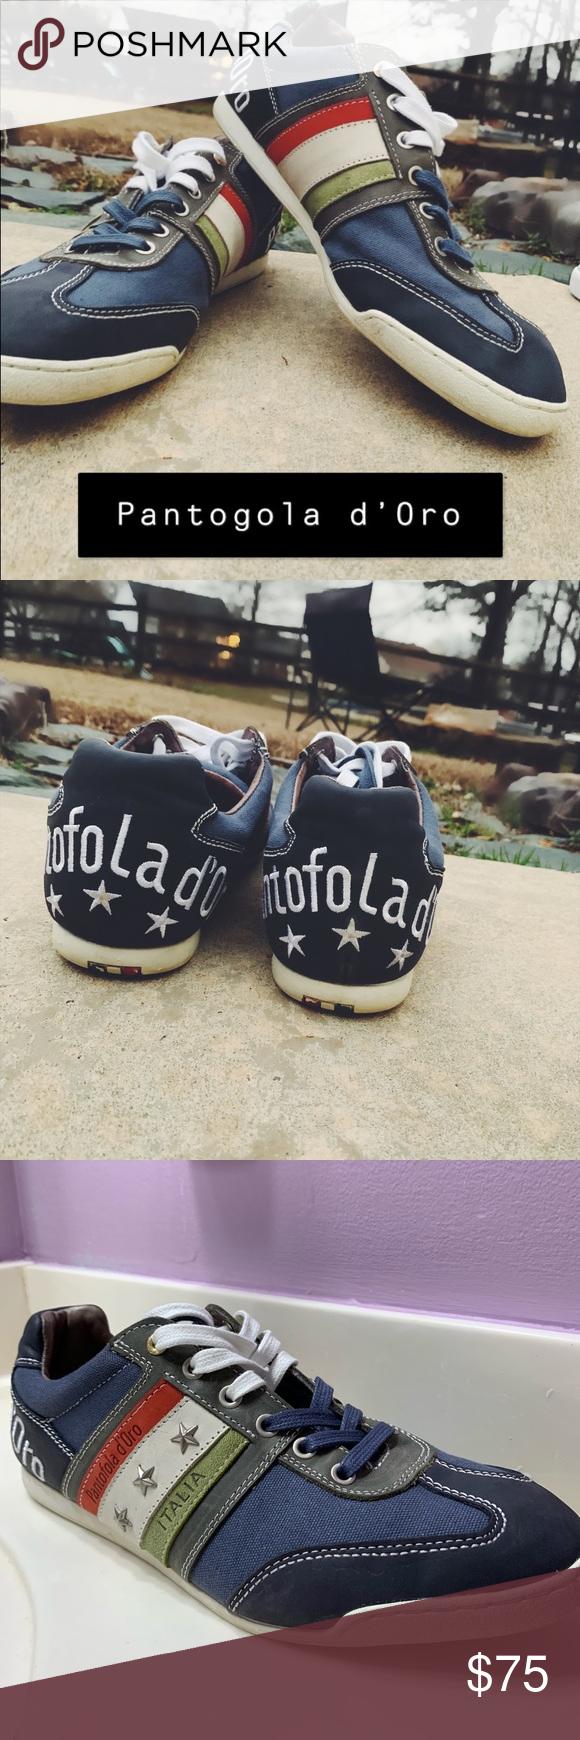 RARE Pantofola d'Oro Shoes! | Shoes